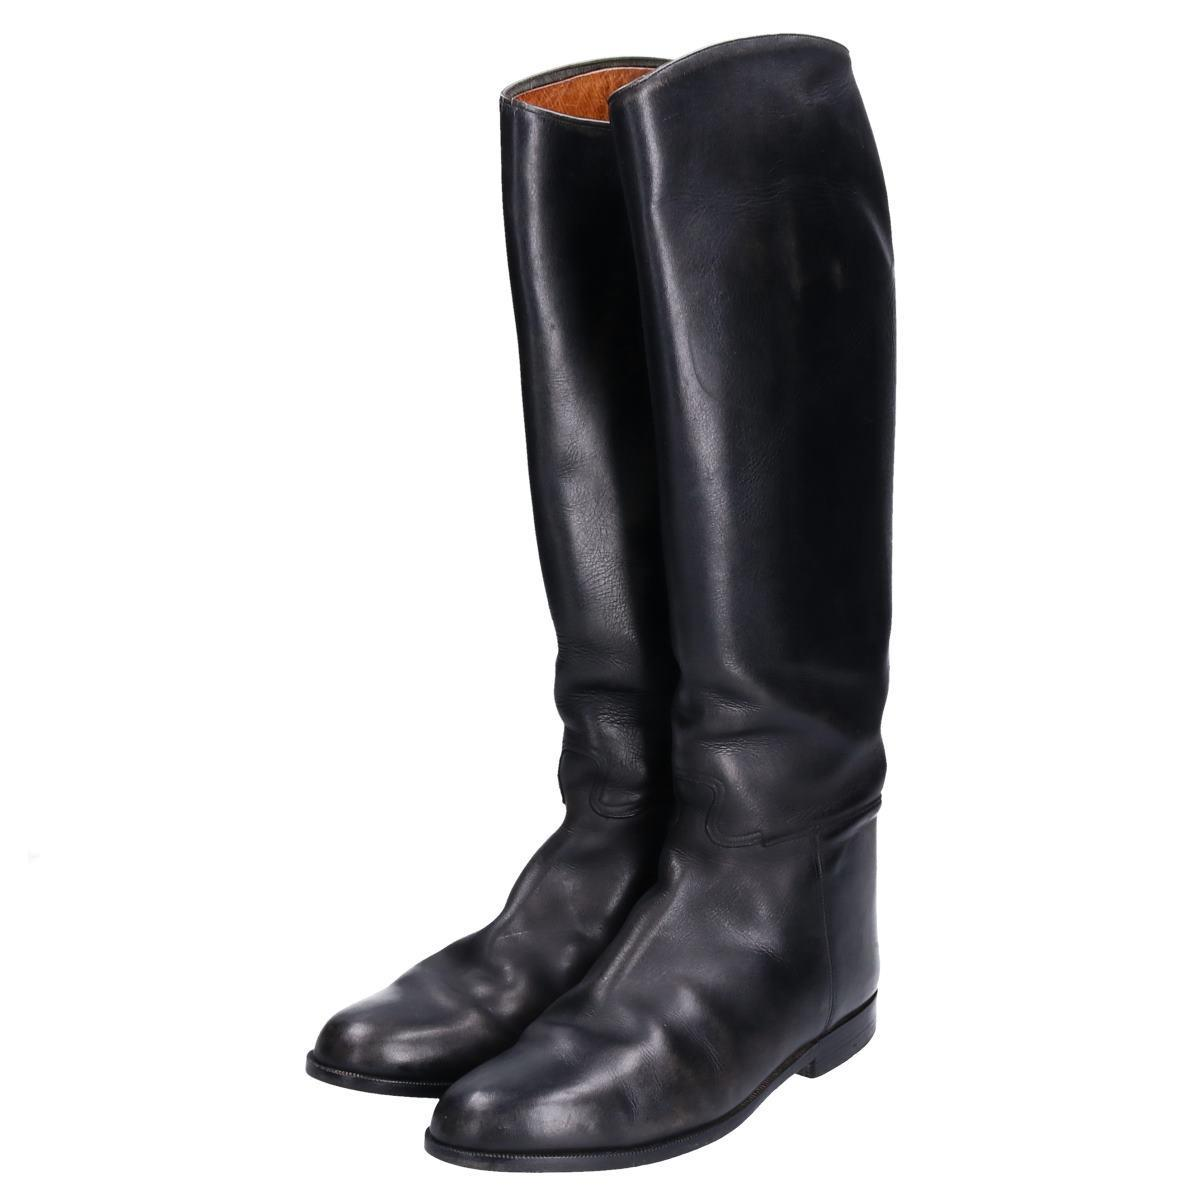 UNKNOWN 本革レザー ジョッキー乗馬ブーツ 7.5 メンズ25.5cm /bop6364 【中古】 【190923】